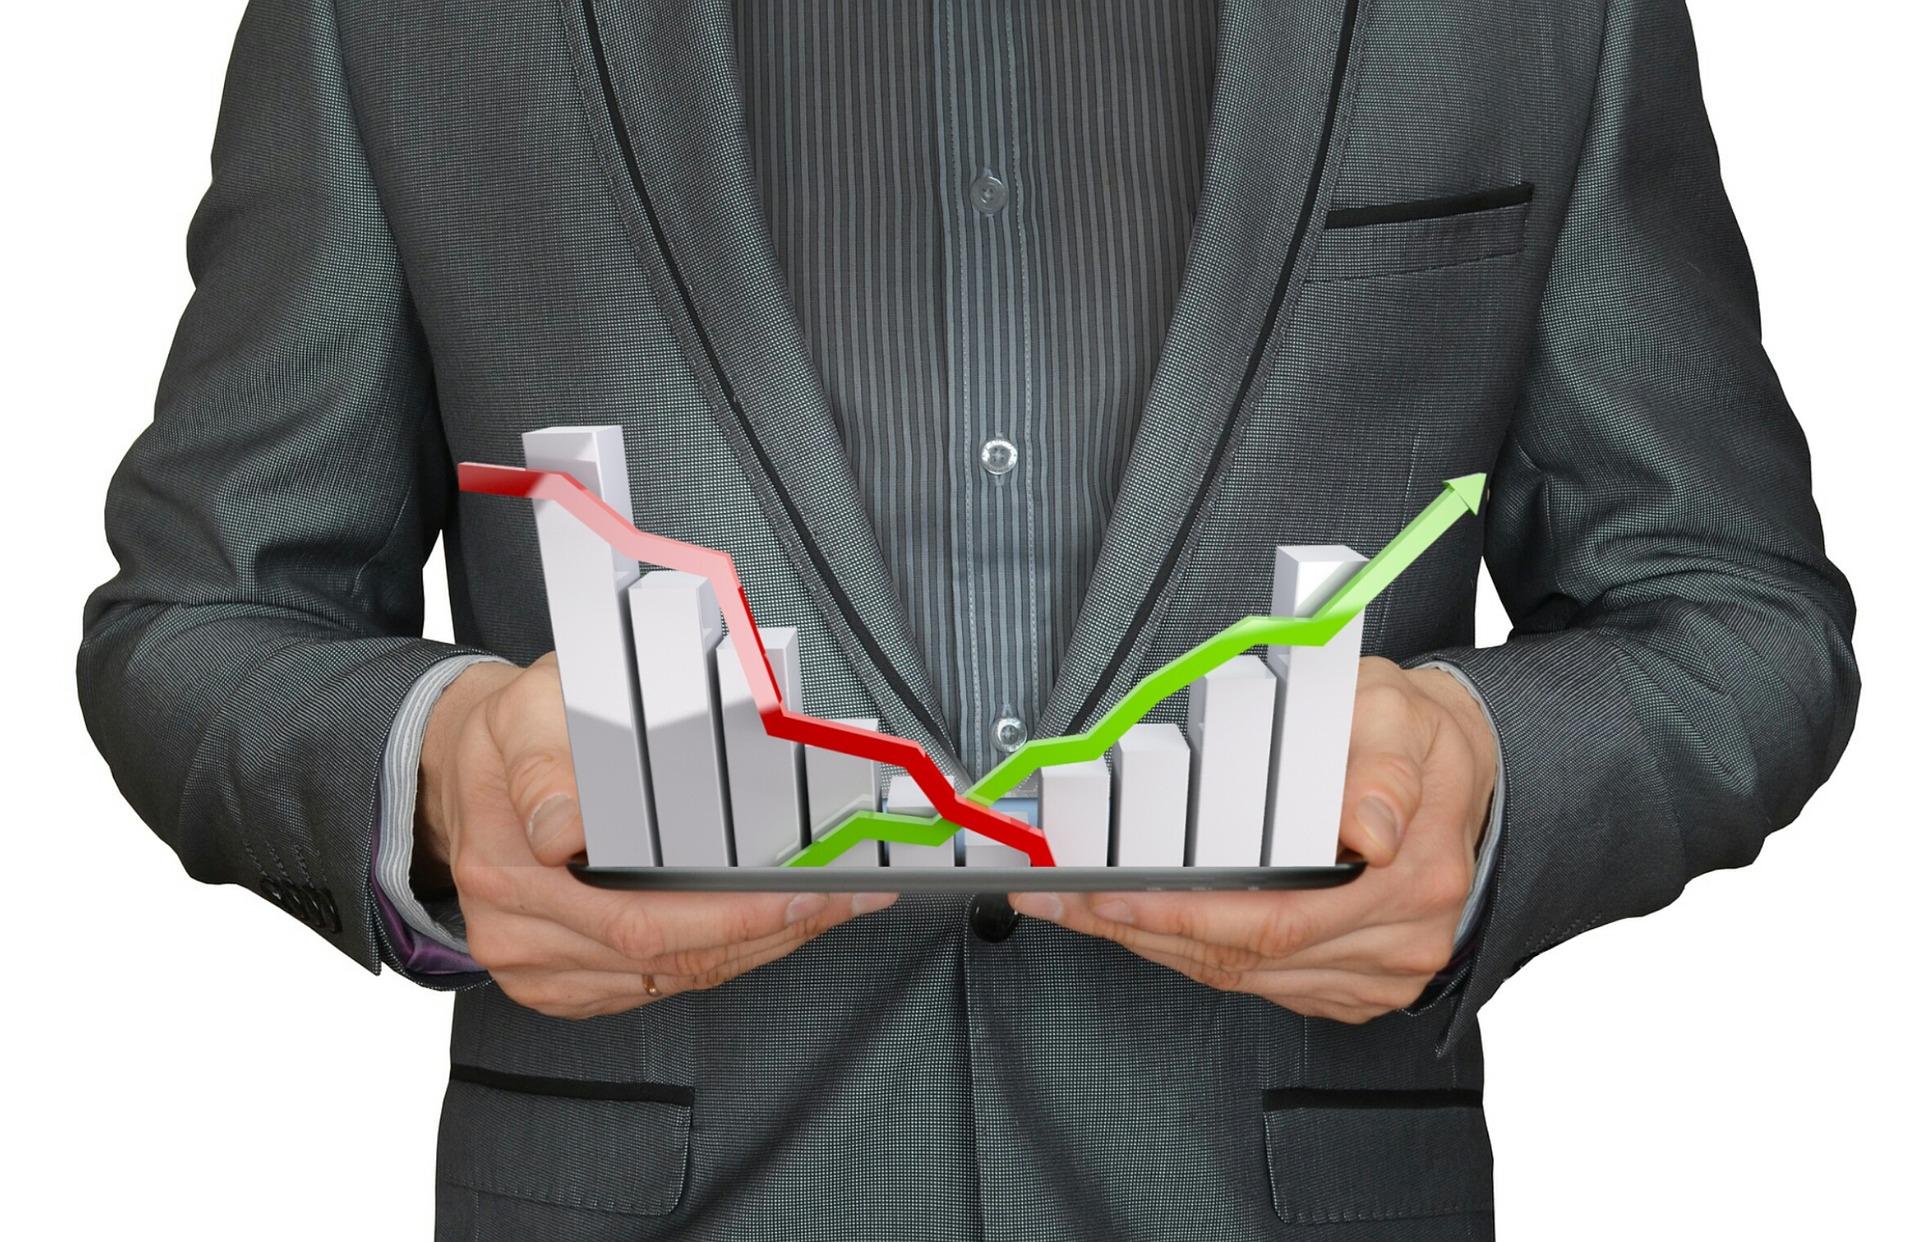 US STOCKS-Market rises on Cisco outlook, drop in oil